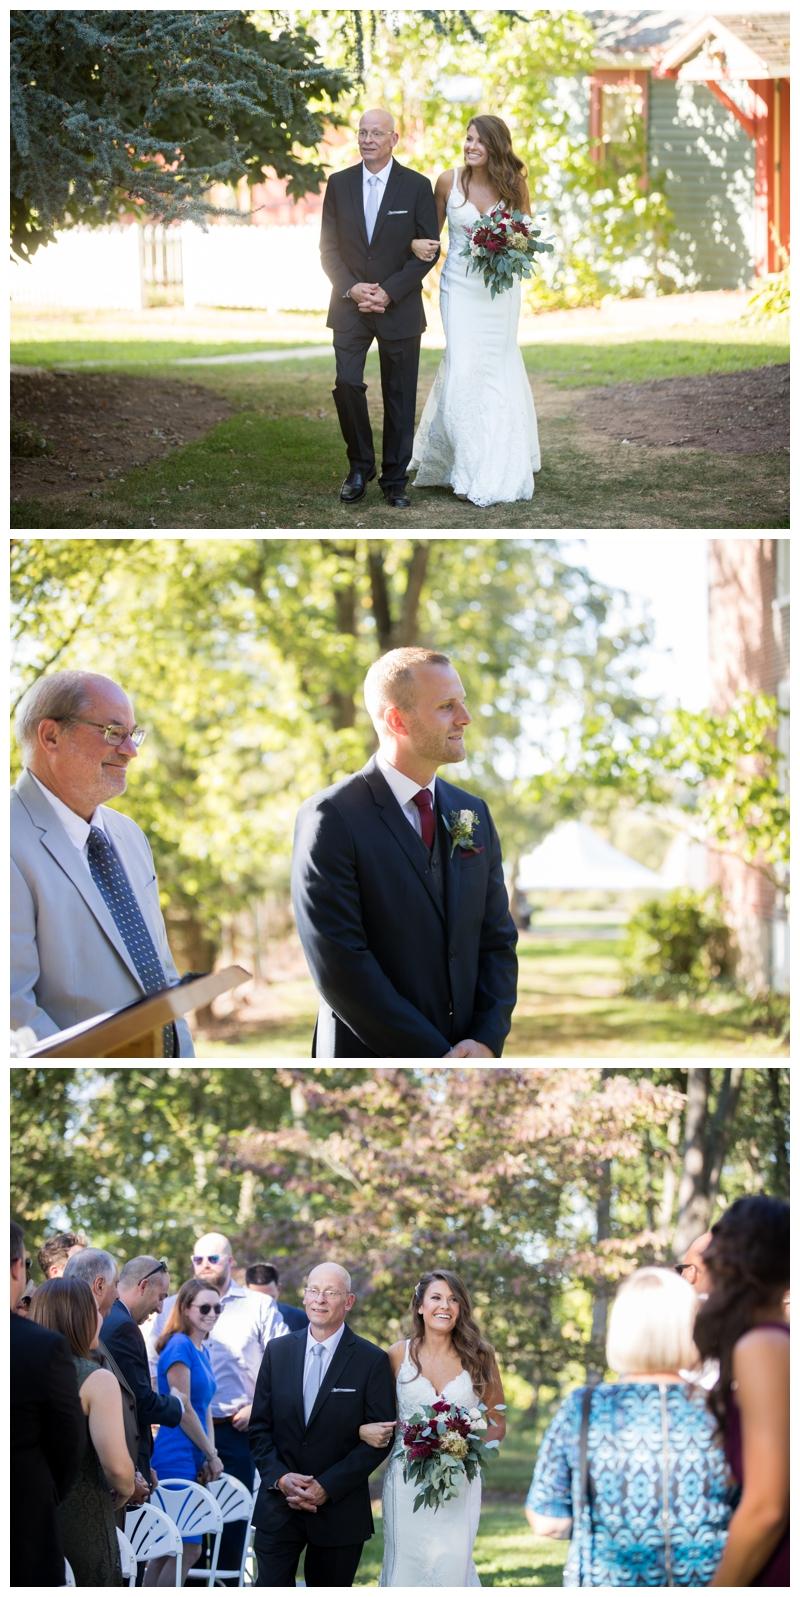 unionville-vineyards-wedding-styled-pink-photography-8.jpg